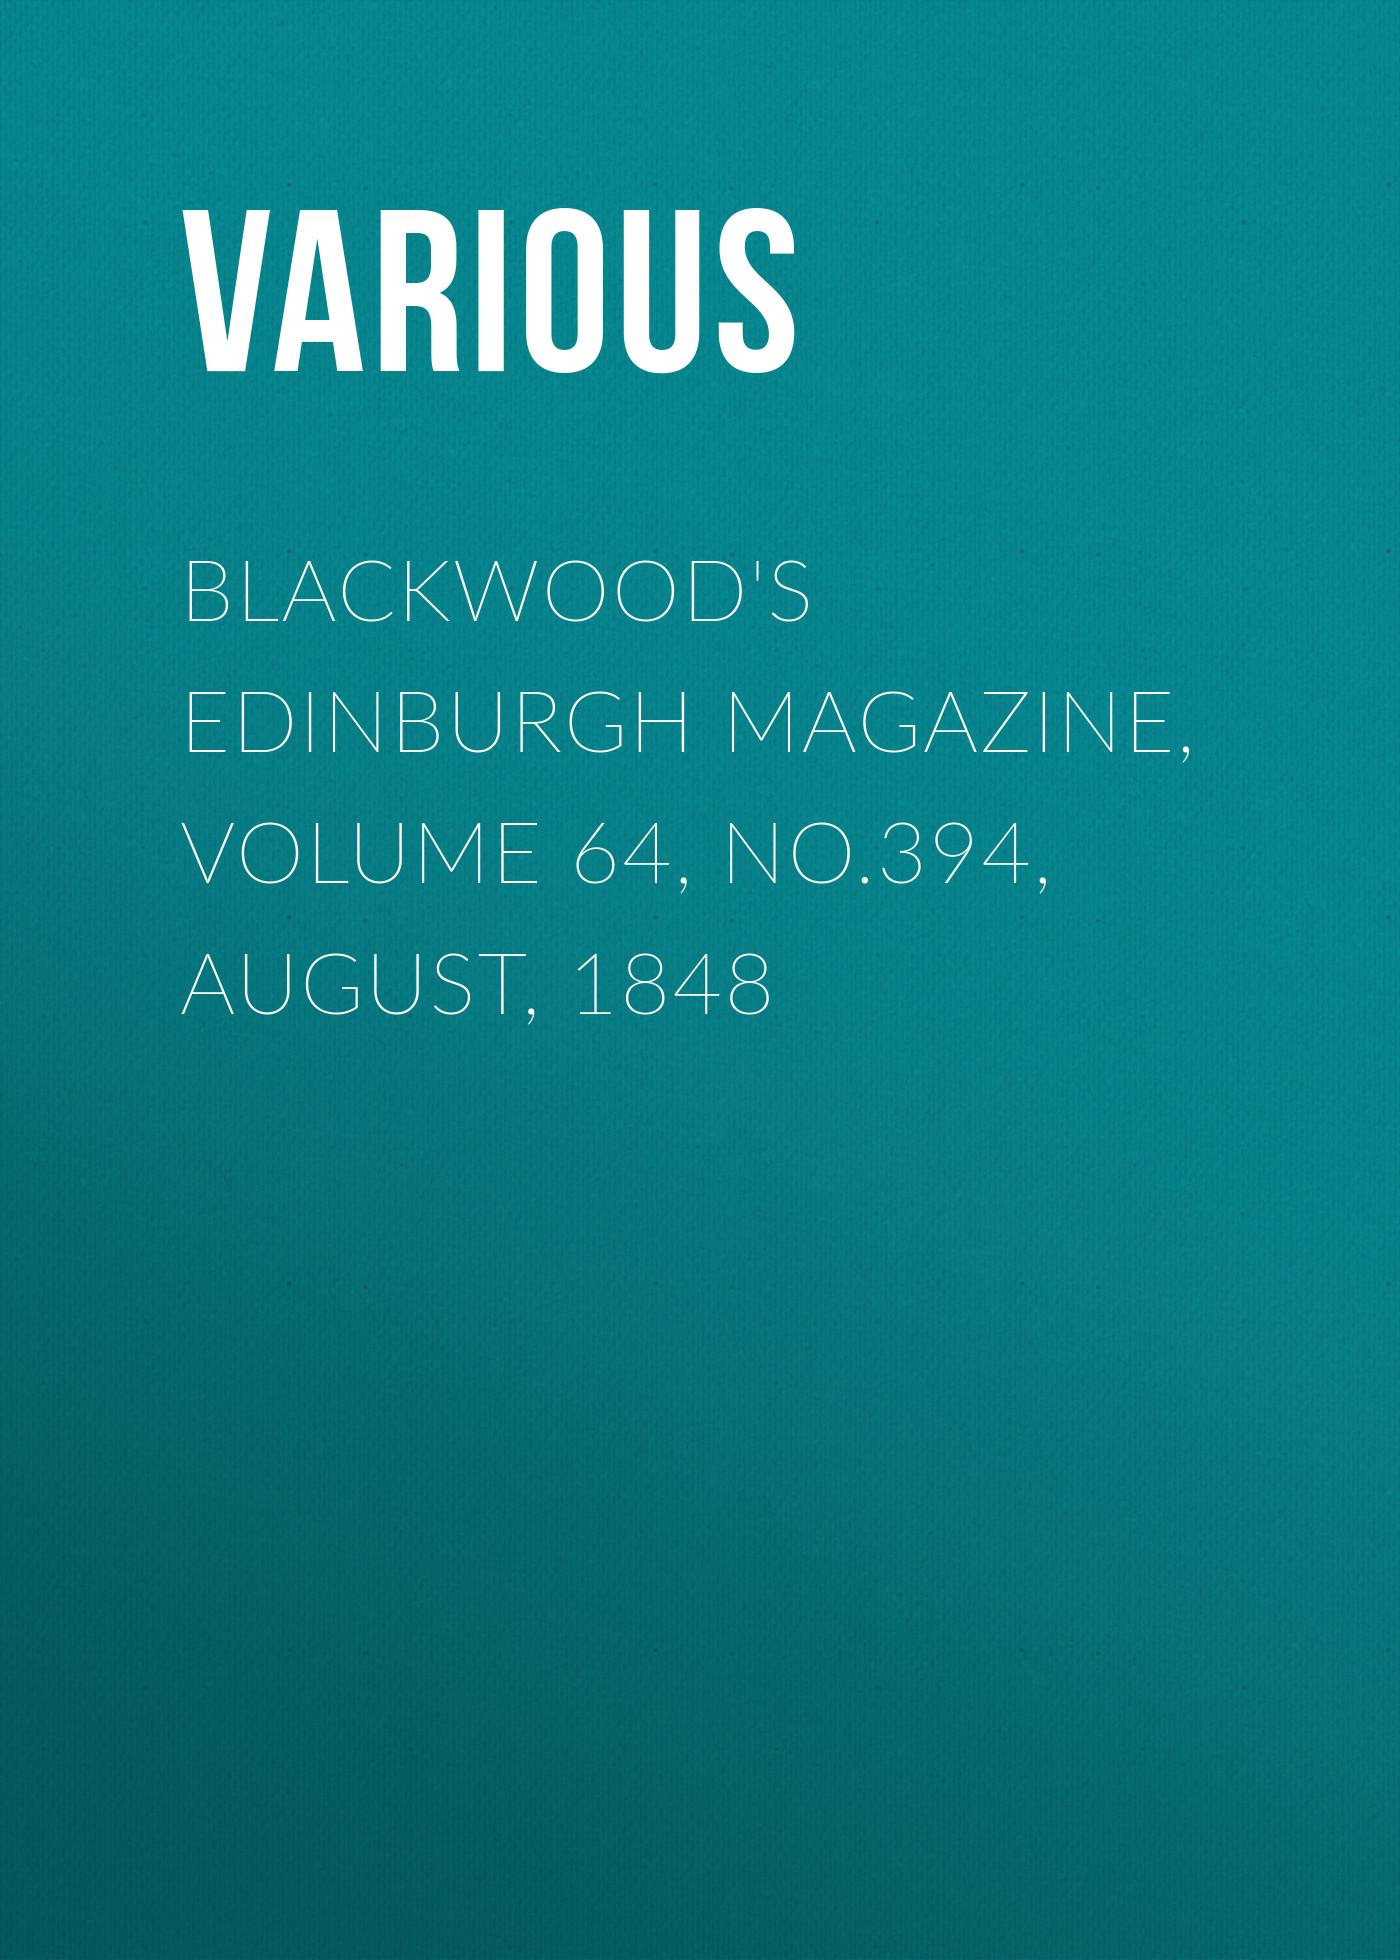 Various Blackwood's Edinburgh Magazine, Volume 64, No.394, August, 1848 various blackwood s edinburgh magazine volume 62 number 385 november 1847